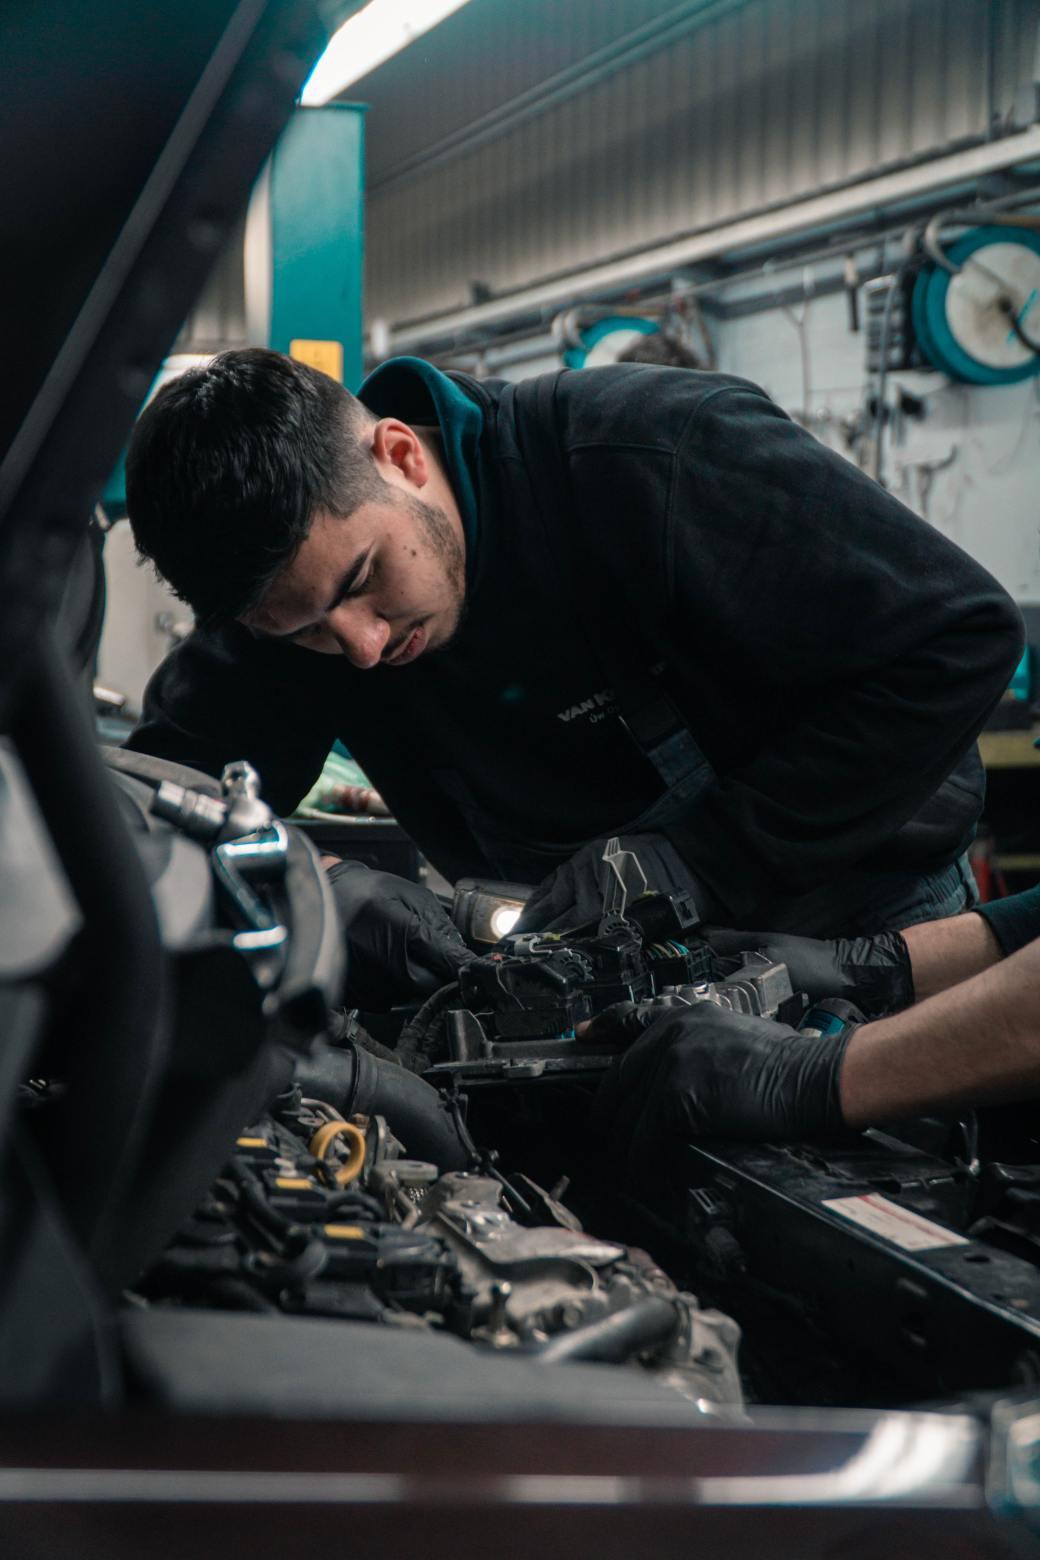 mecánico haciendo diagnóstico del coche